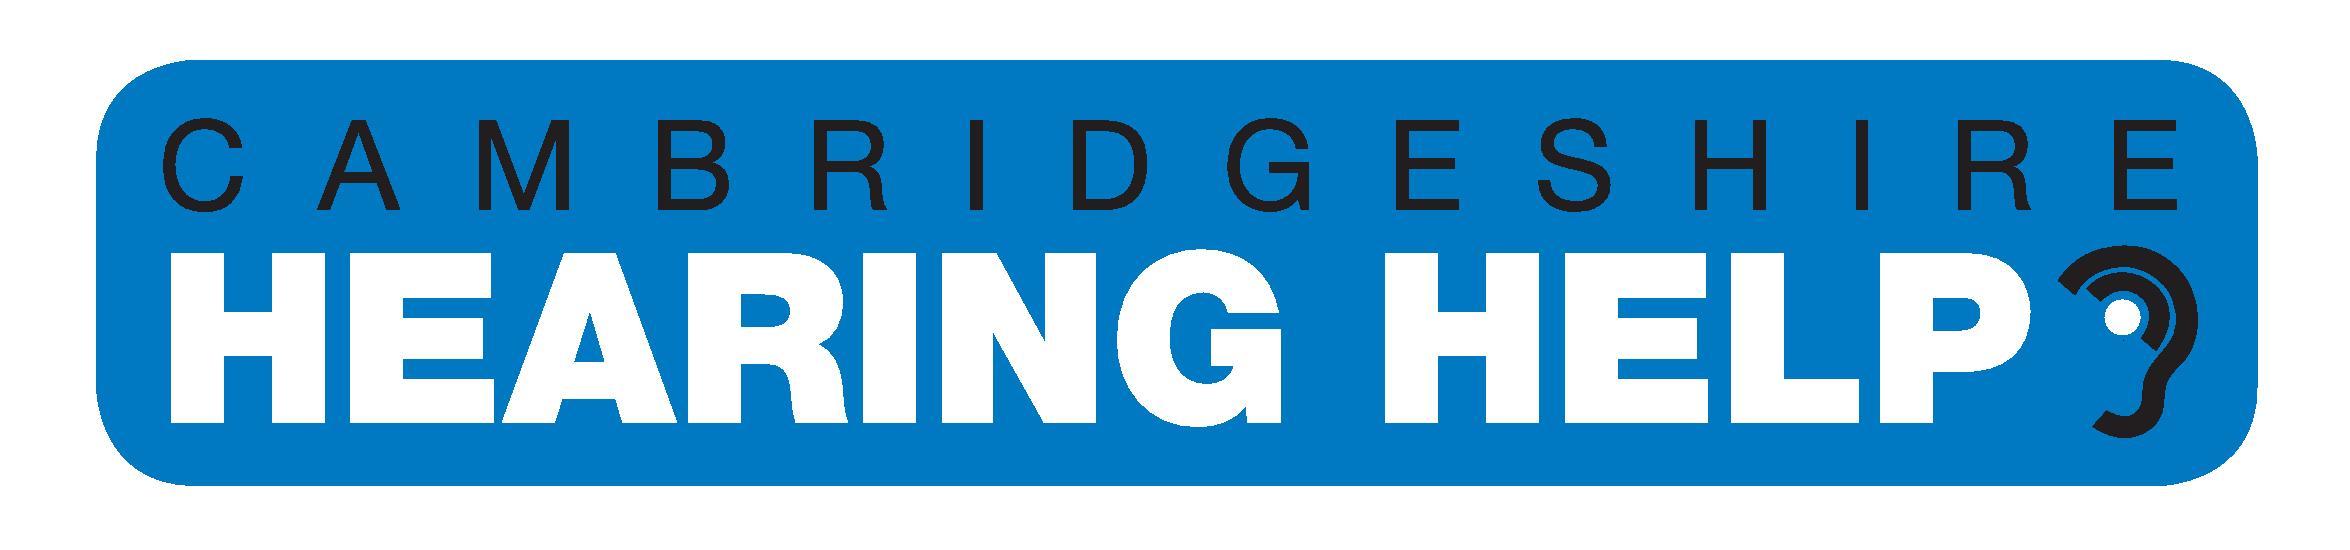 CHH 2013 logo small